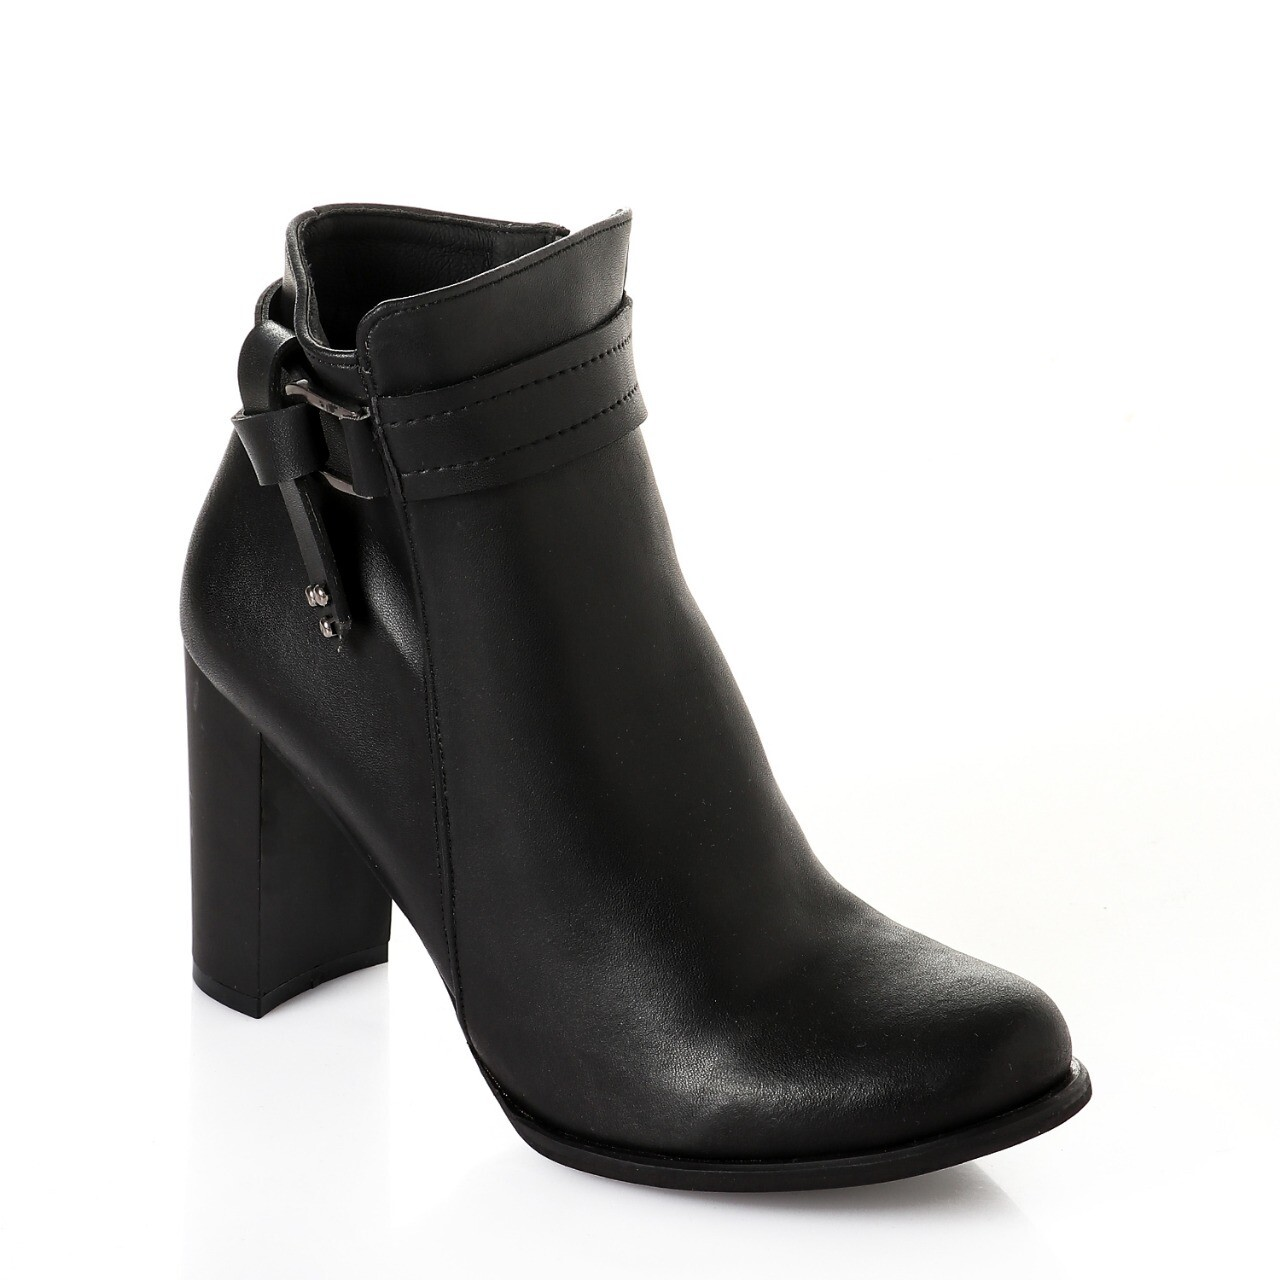 3734 Half Boot - Black